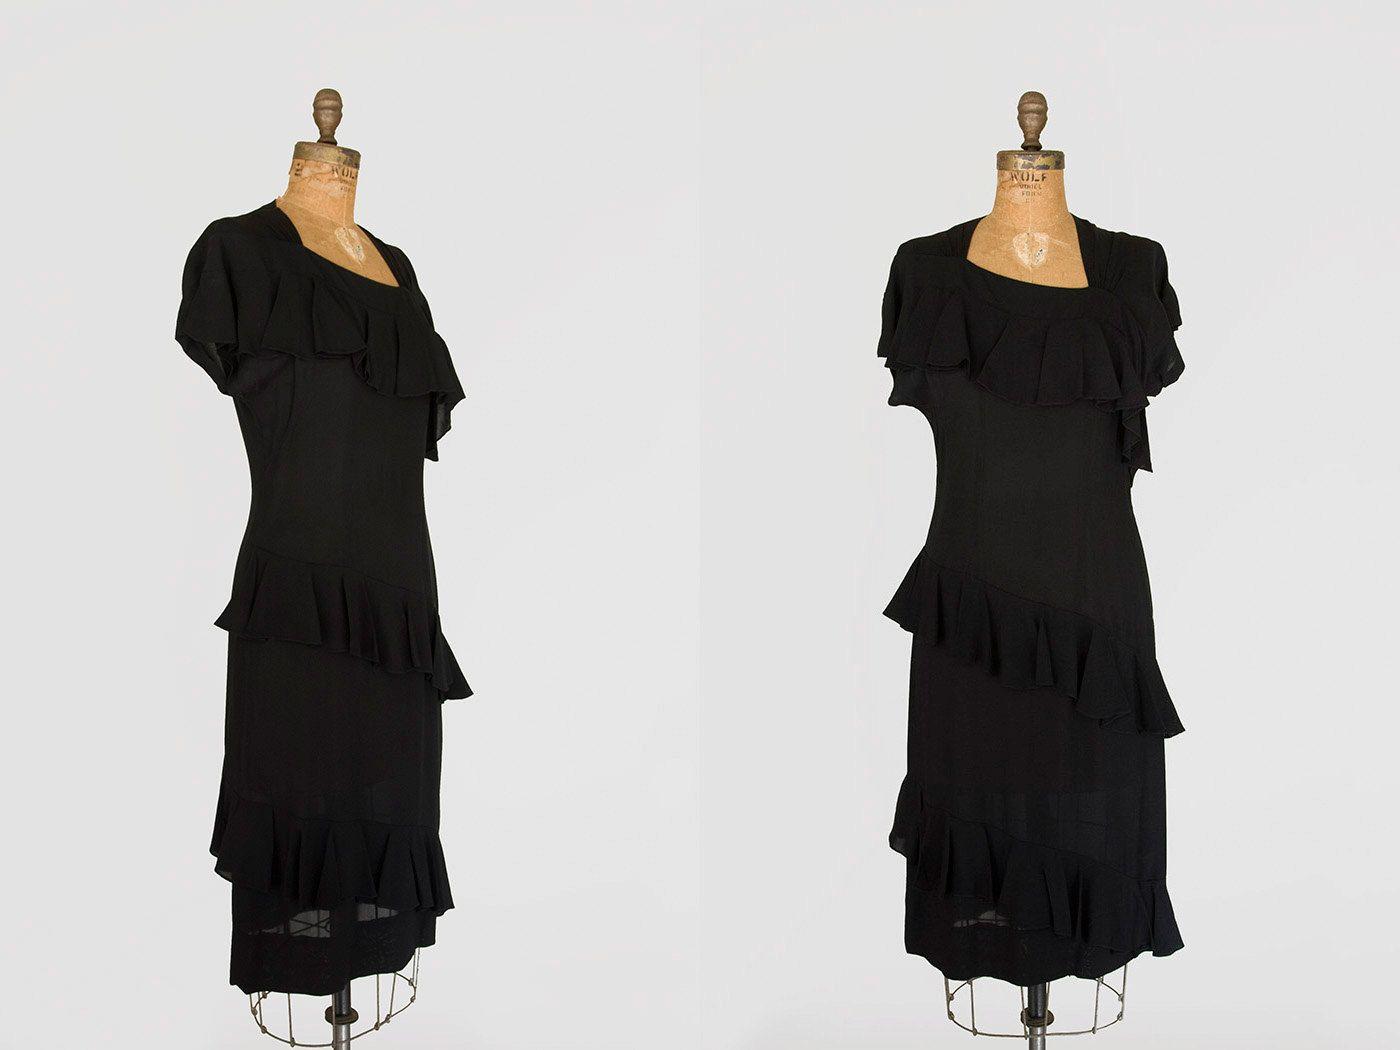 S dress s dress black rayon crepe cocktail dress s